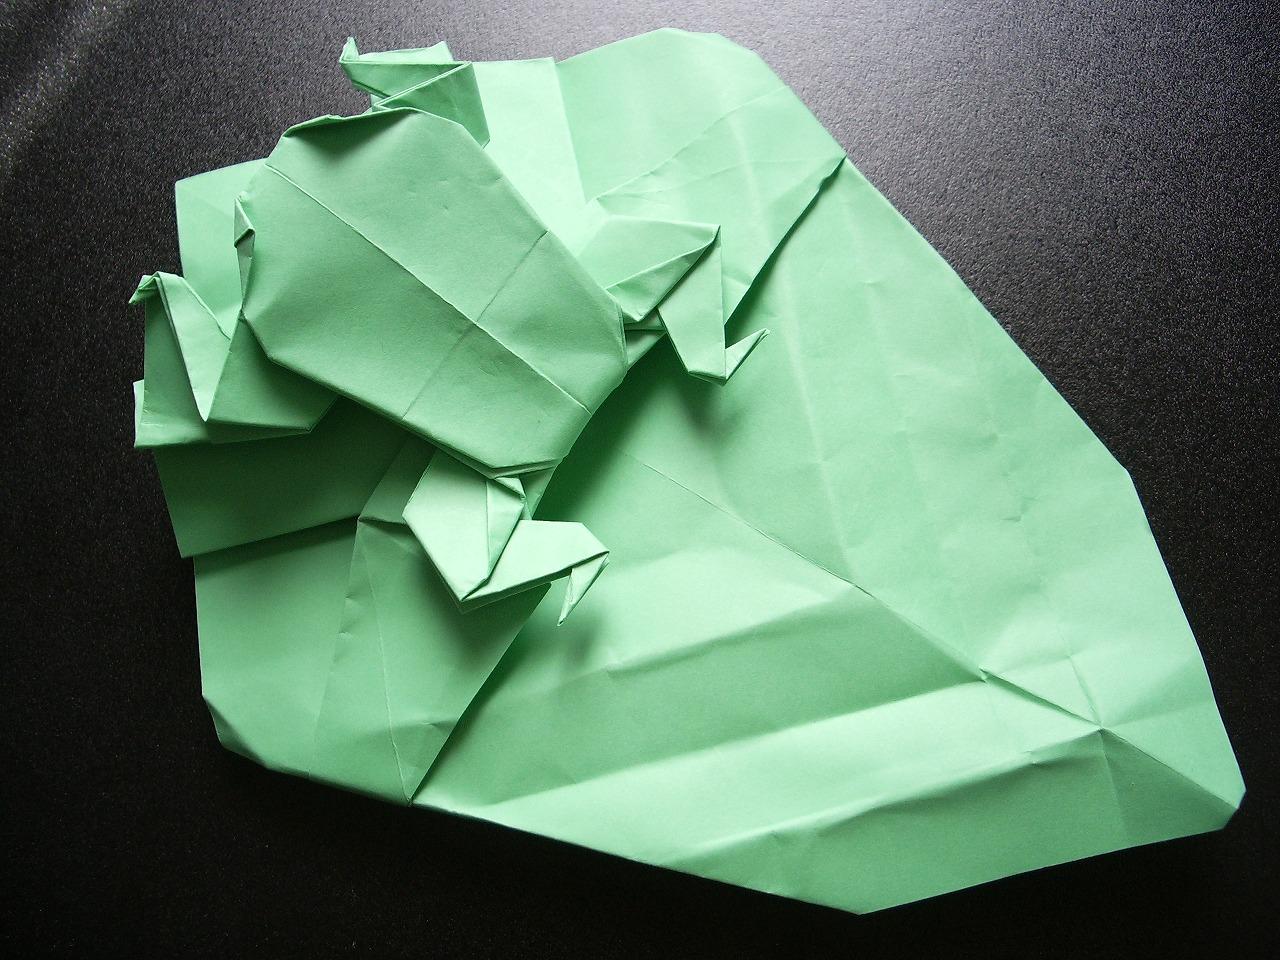 KATAKOTO ORIGAMI: Origami Frog on Origami Leaf - photo#8